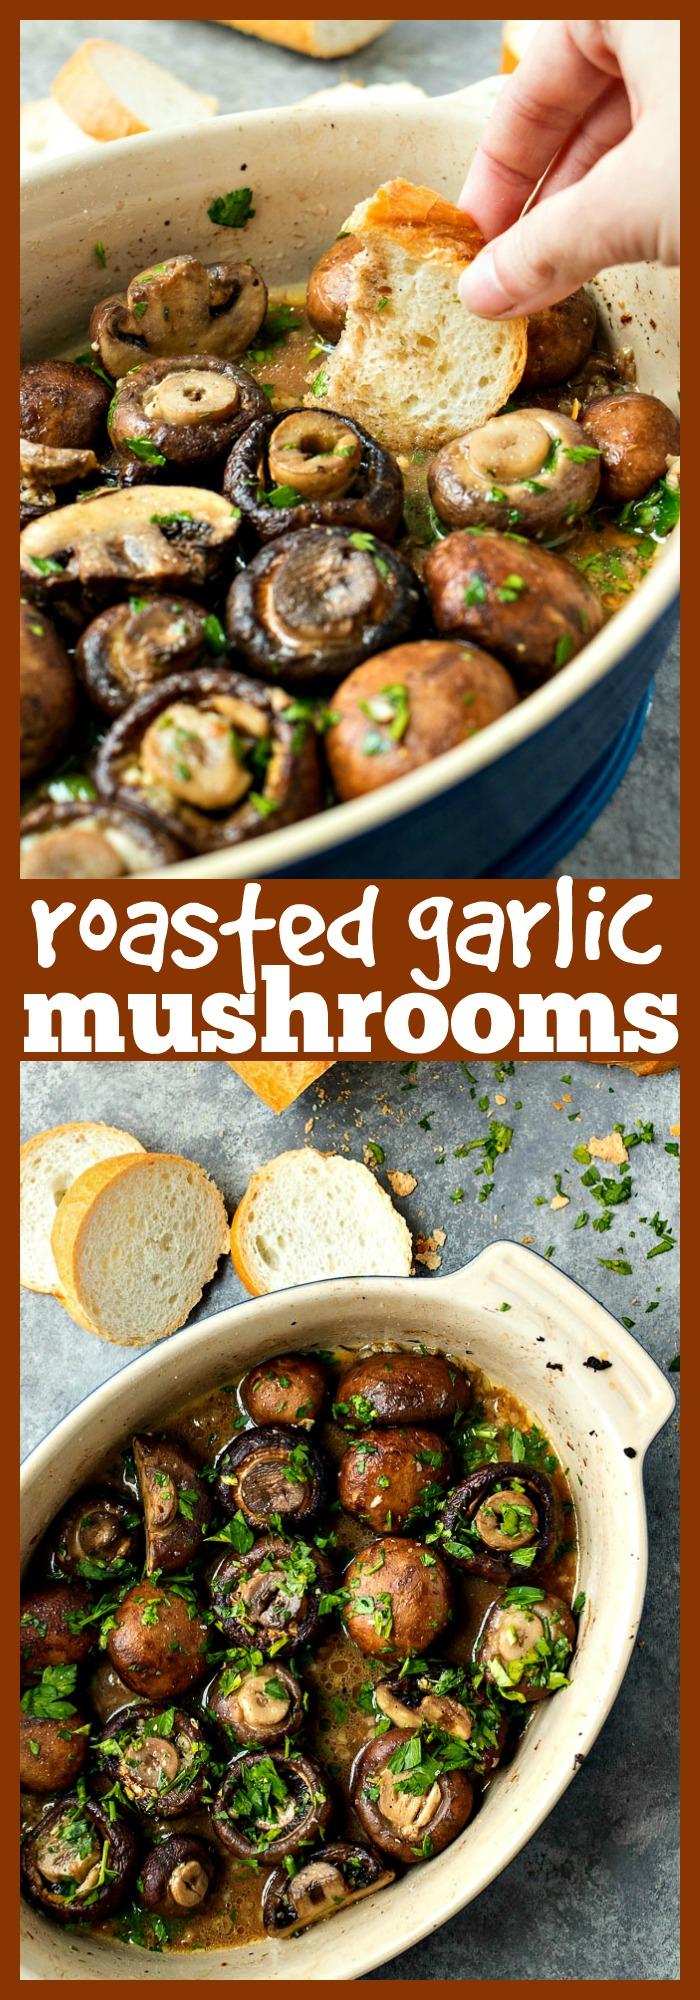 Roasted Garlic Mushrooms photo collage